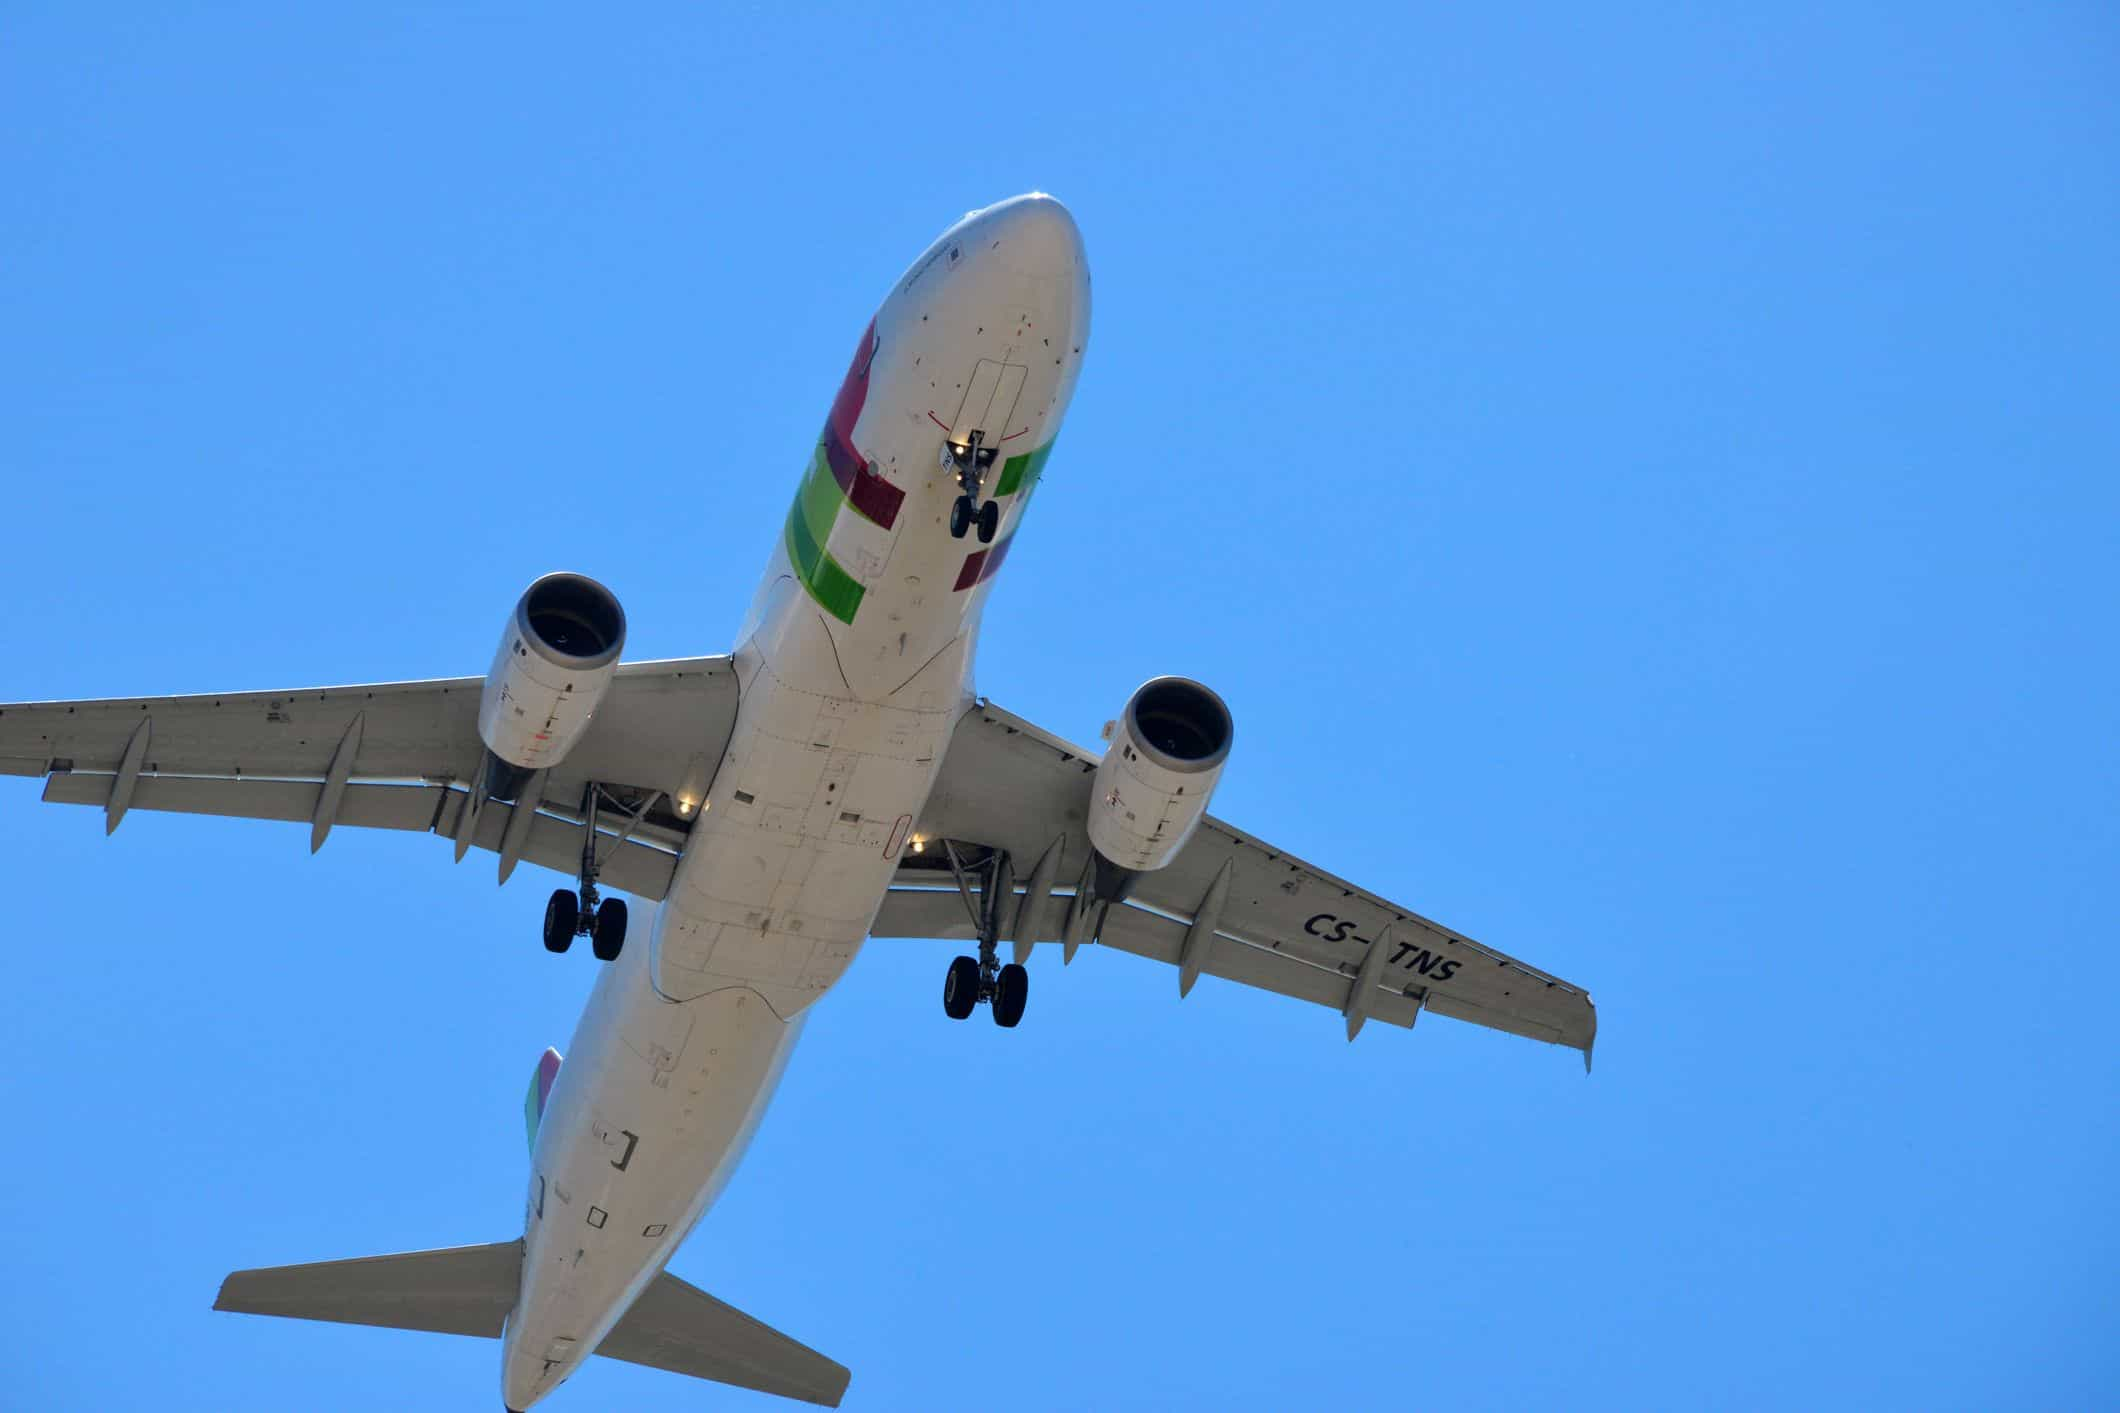 Voo da TAP regressa a Lisboa após descolagem devido a fumo na cabina